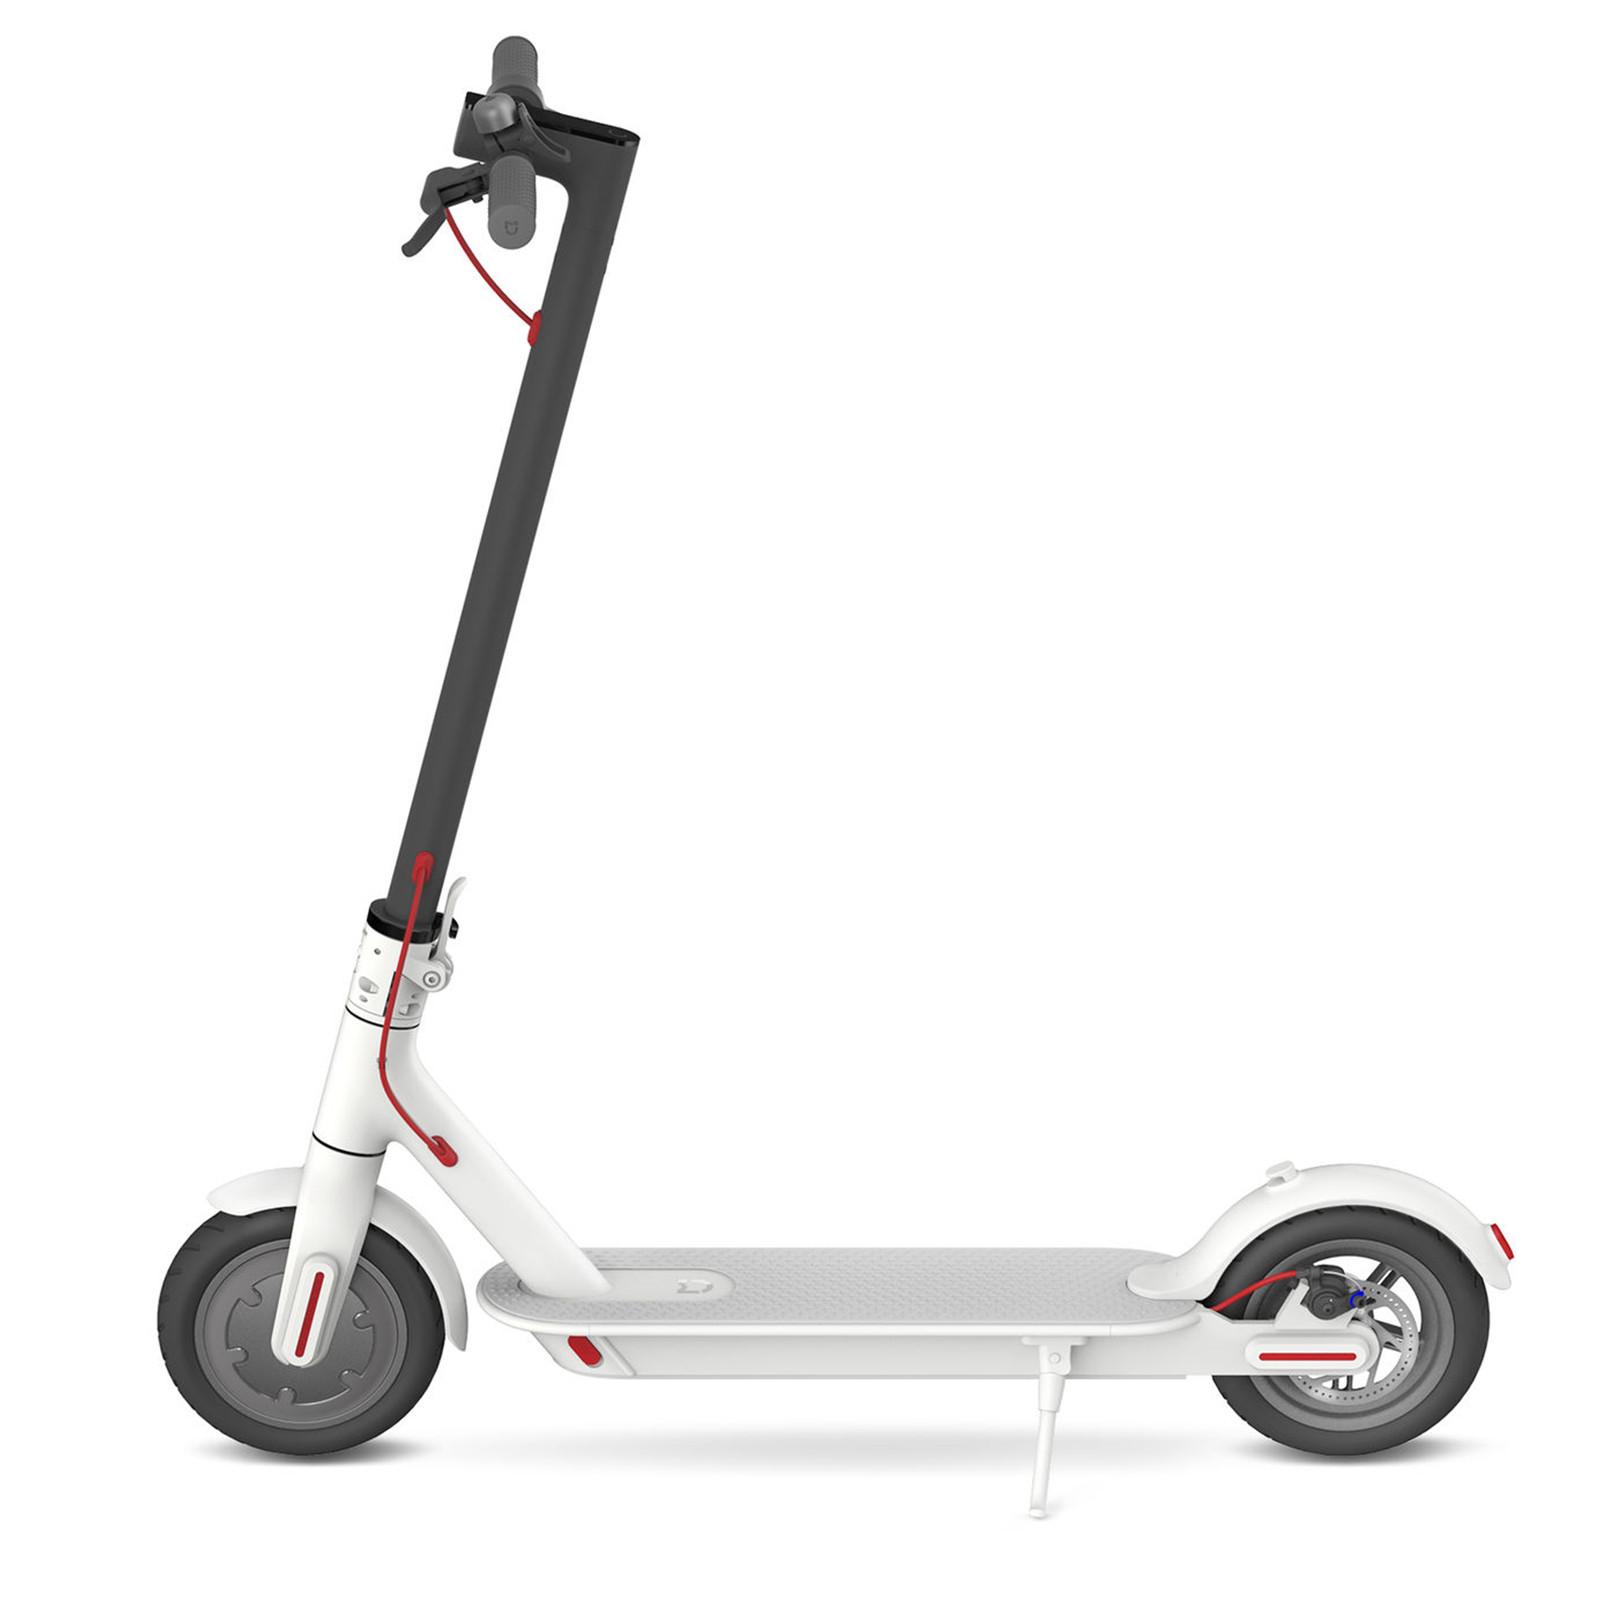 mi home electric scooter white portable folding design. Black Bedroom Furniture Sets. Home Design Ideas